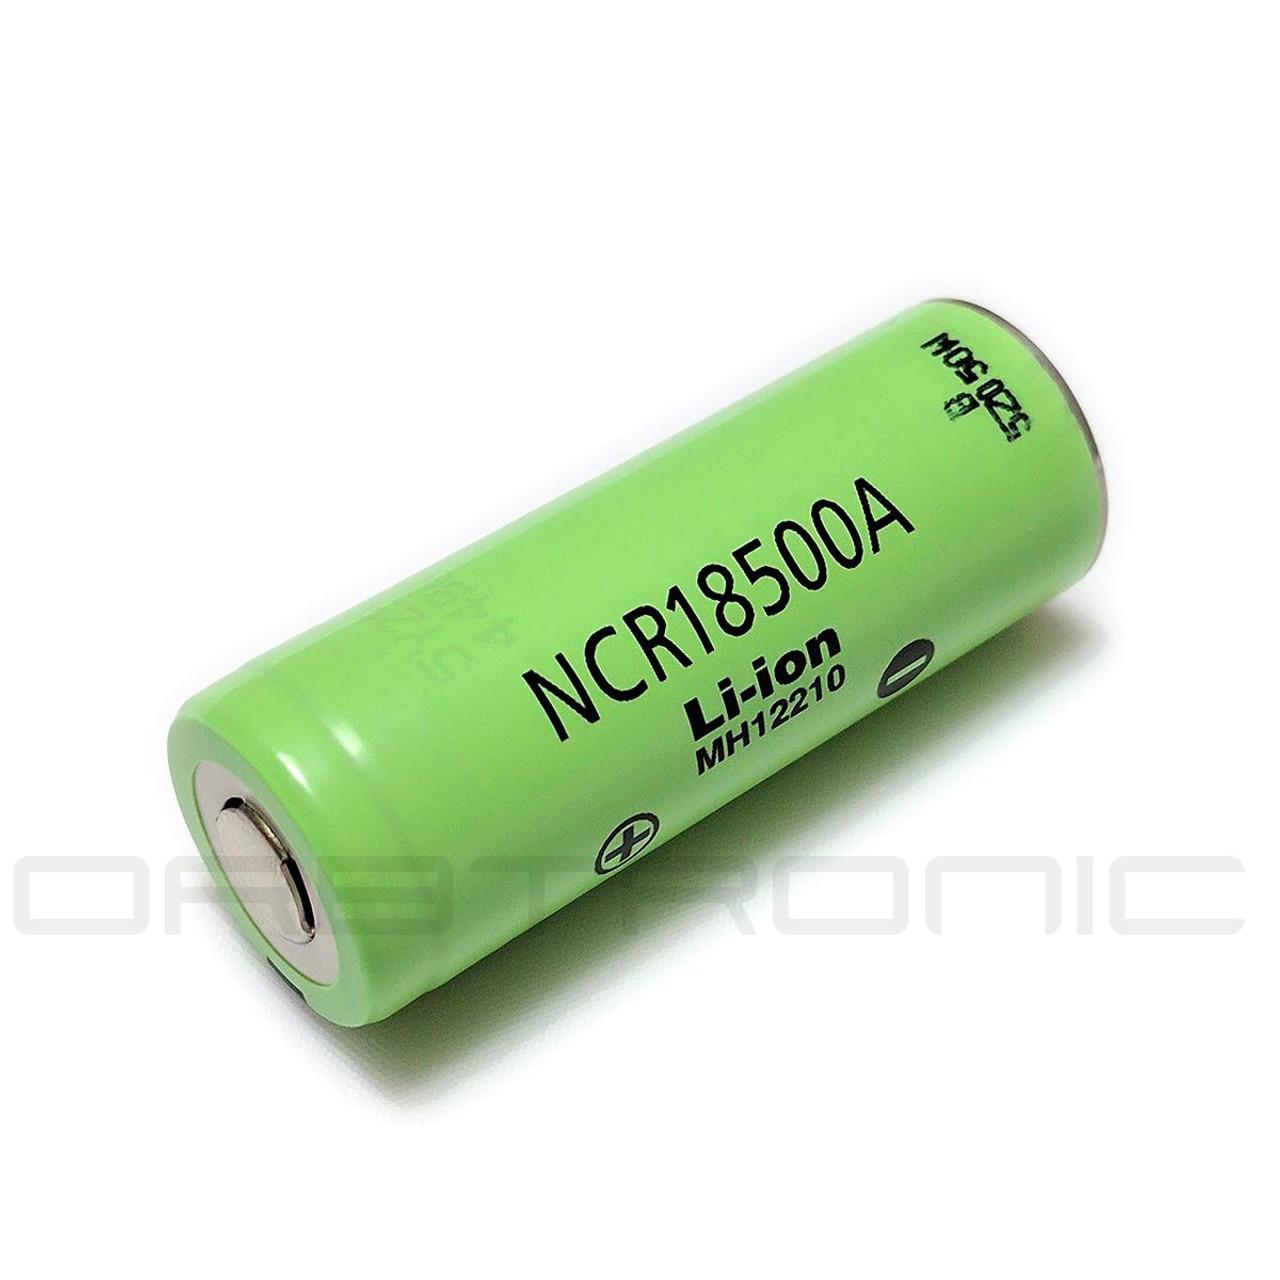 18500 Battery Panasonic NCR18500A li-ion Rechargeable Flat Top 3 7V 2040mAh